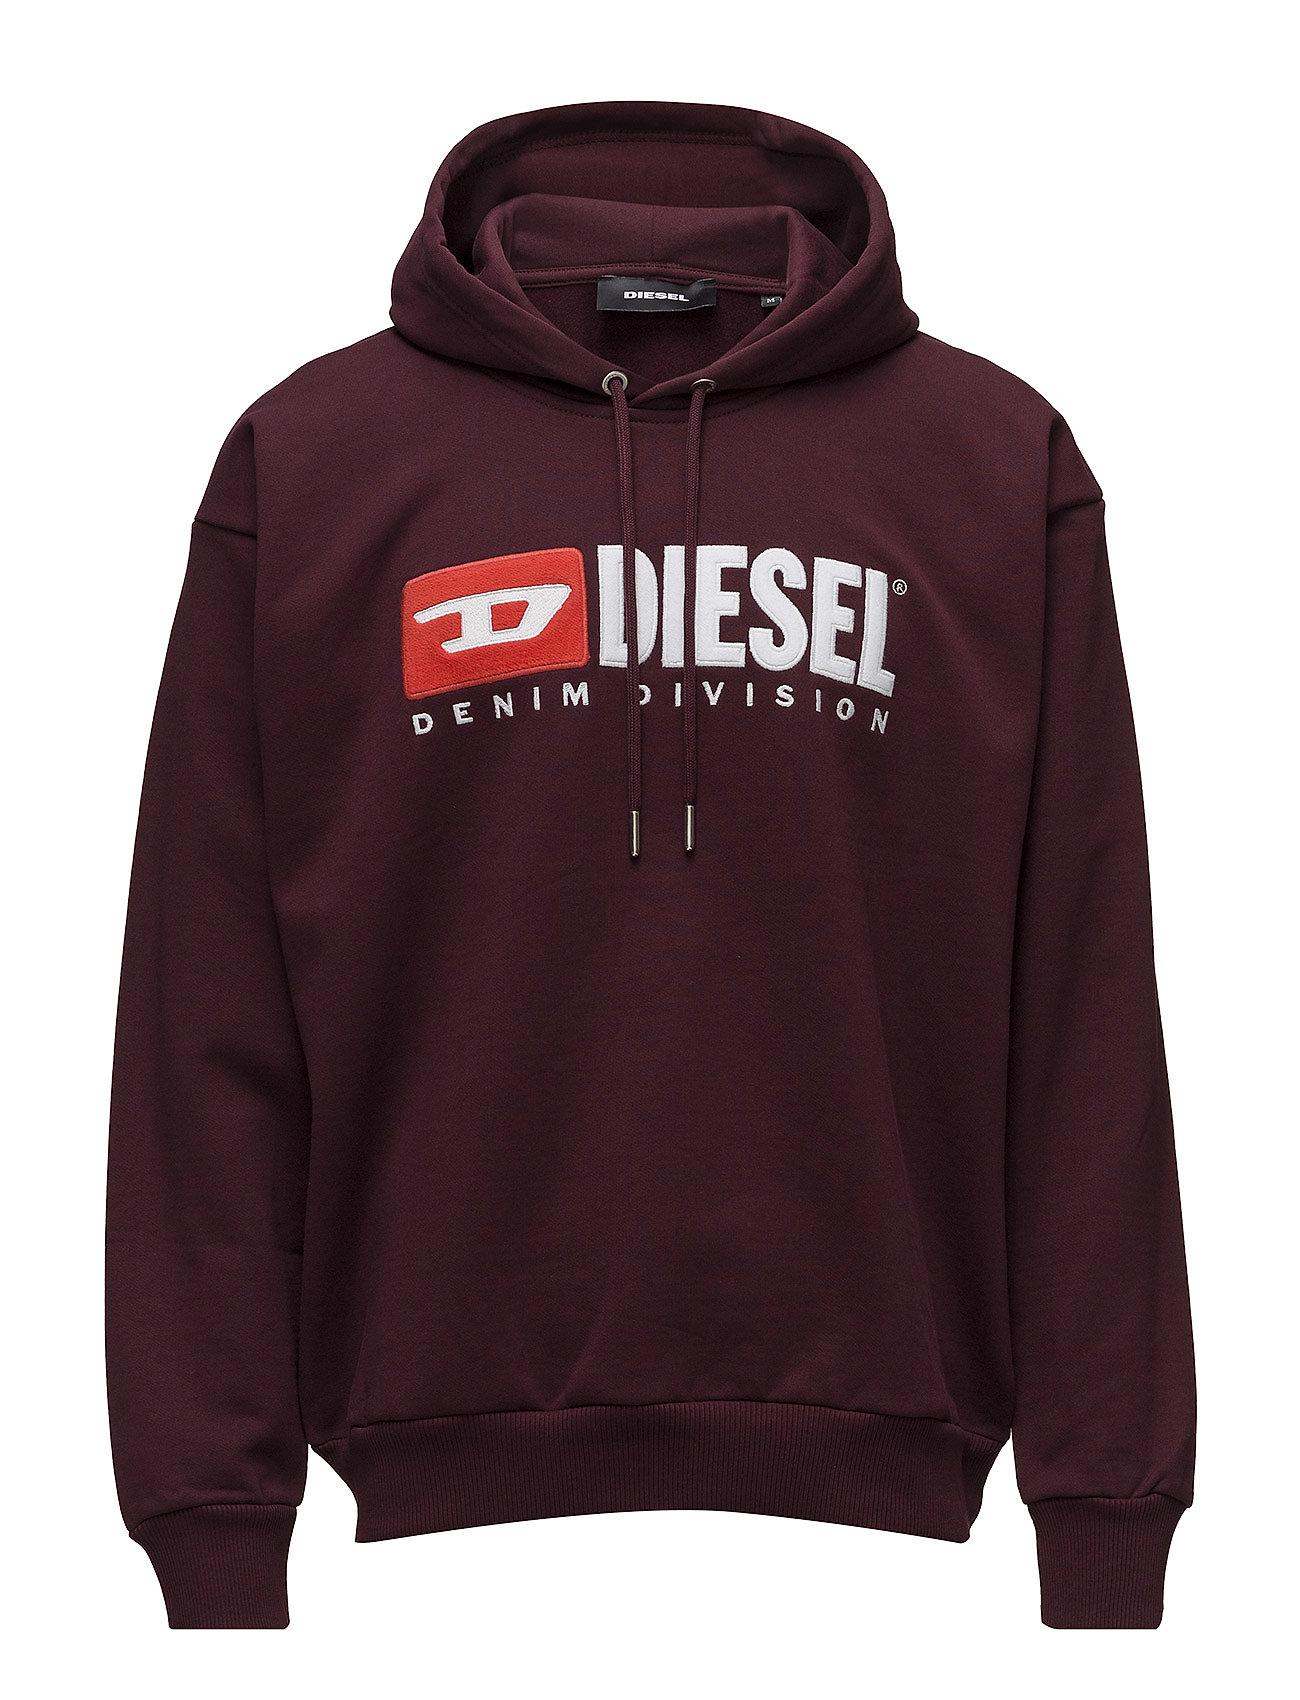 S-Division Sweat-Shirt - Diesel Men